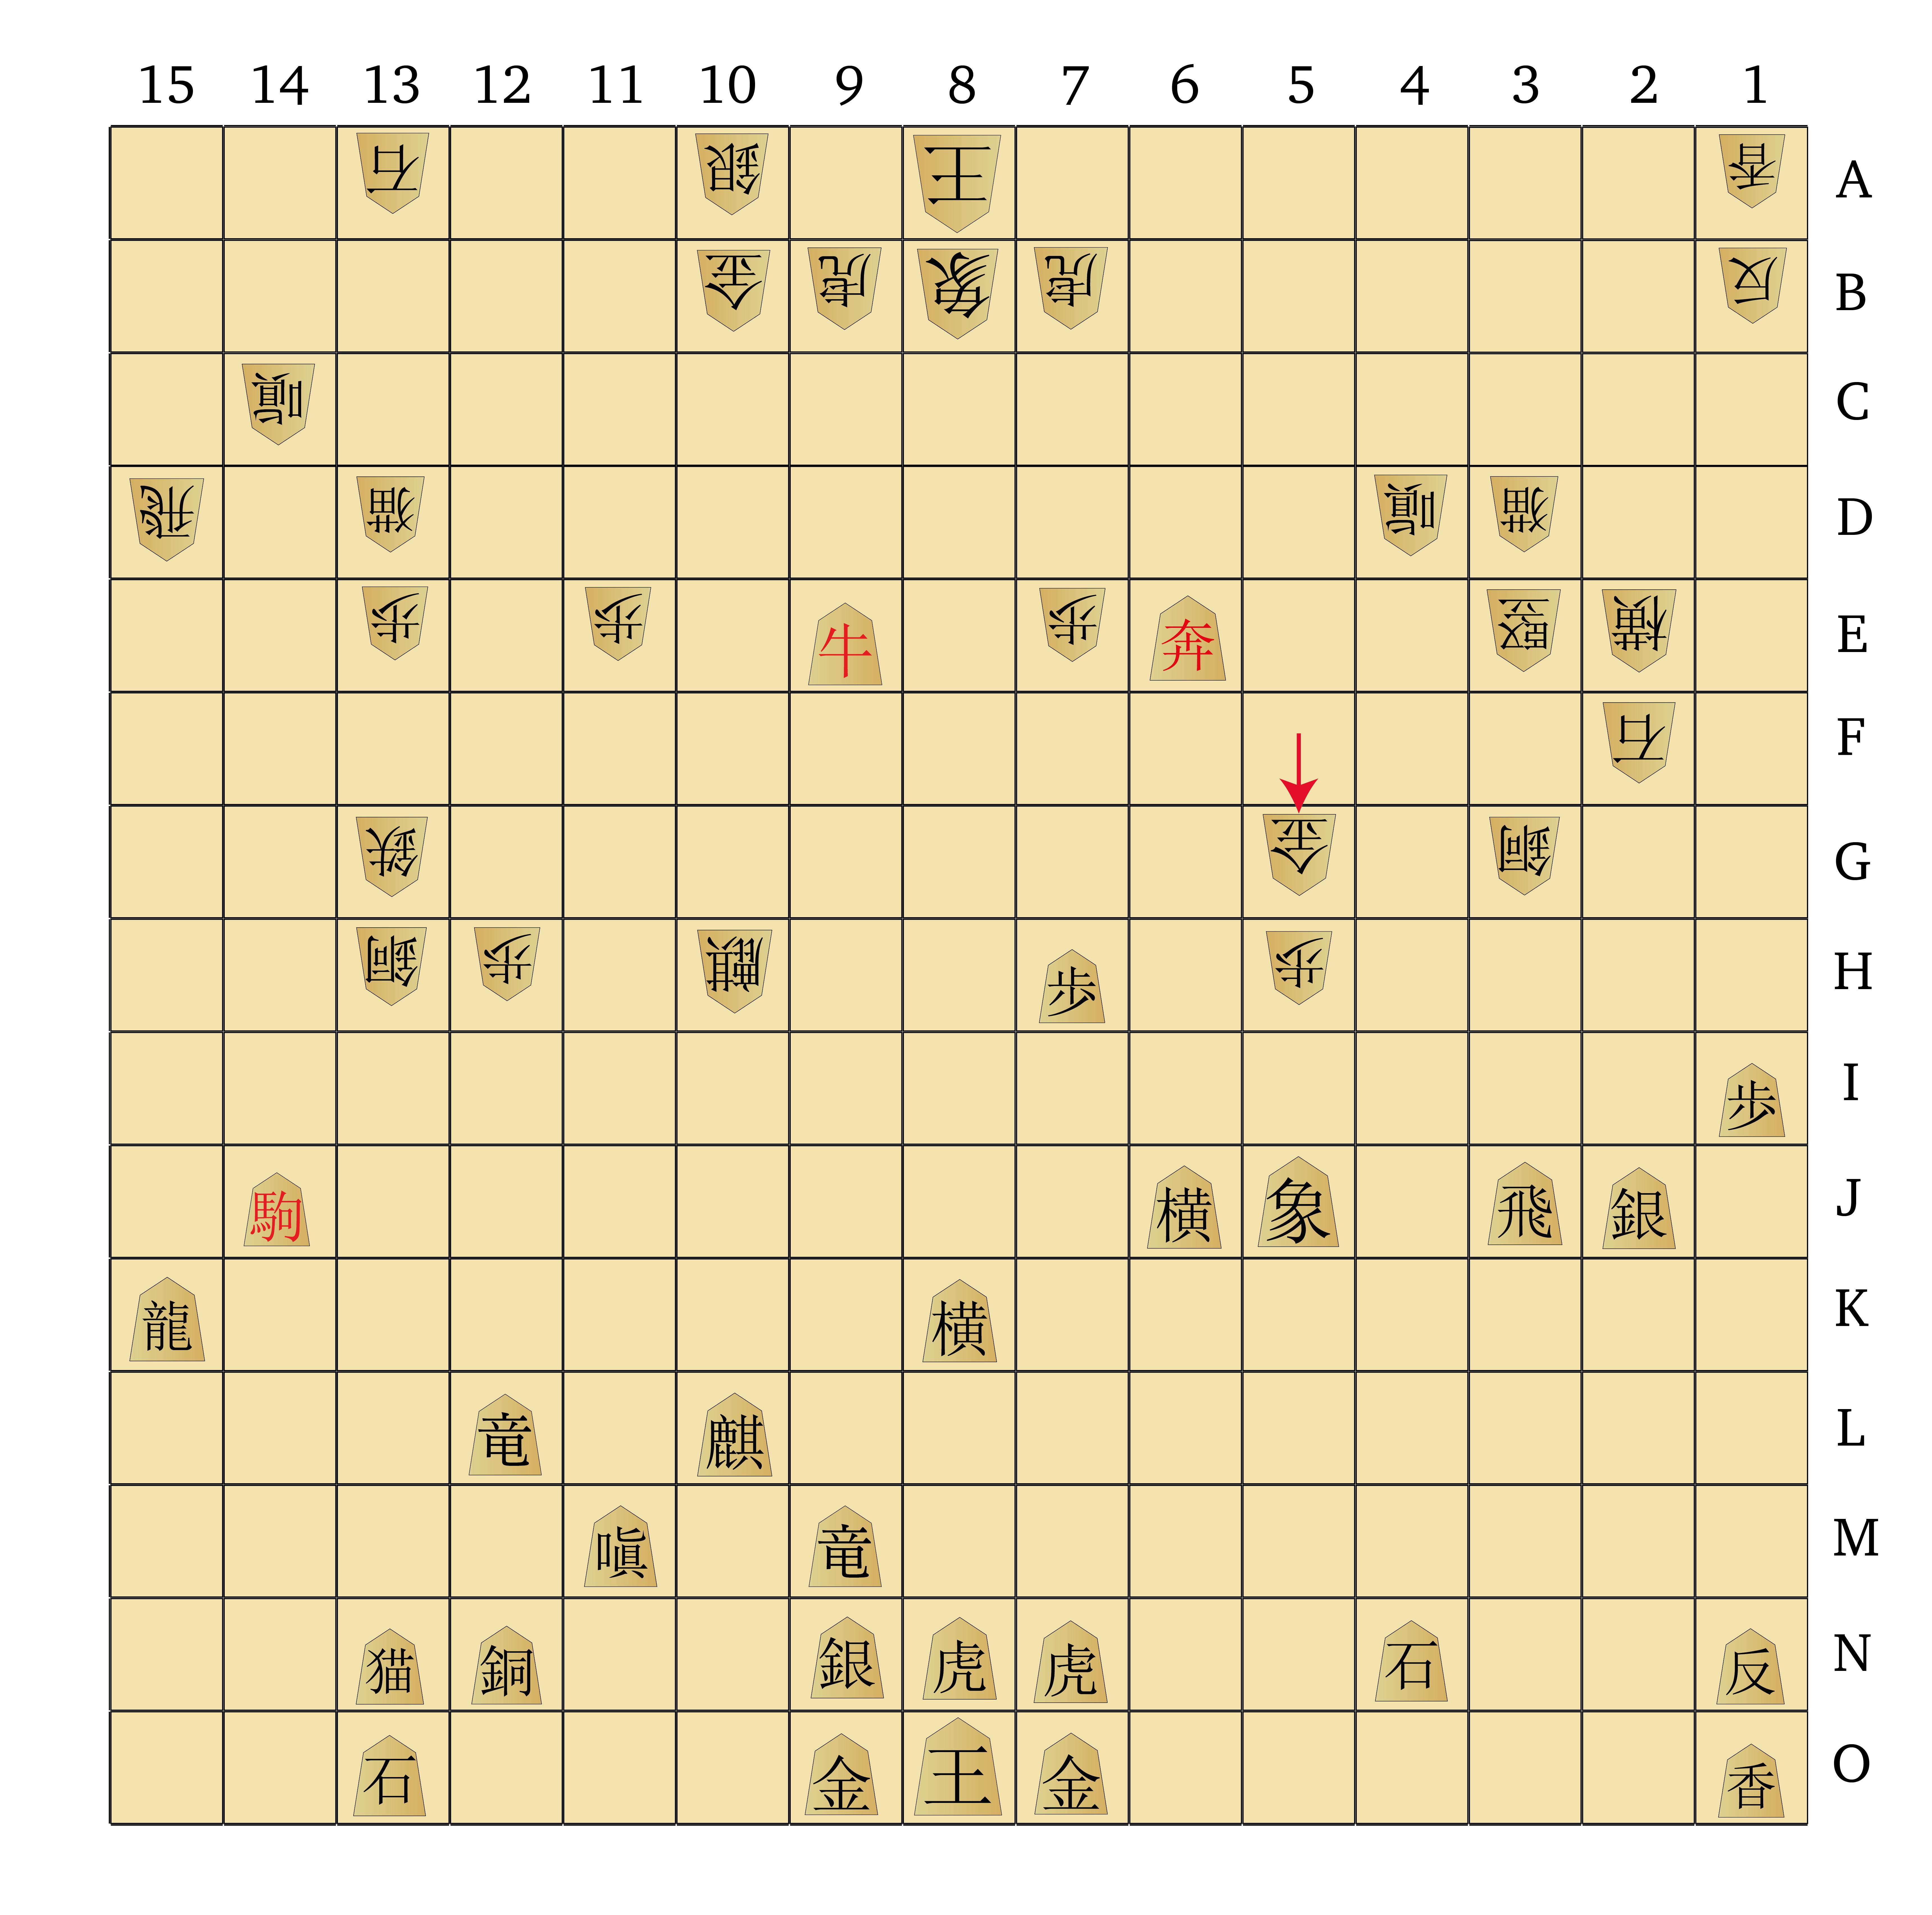 Dai Shogi 420 -- Move 430-01